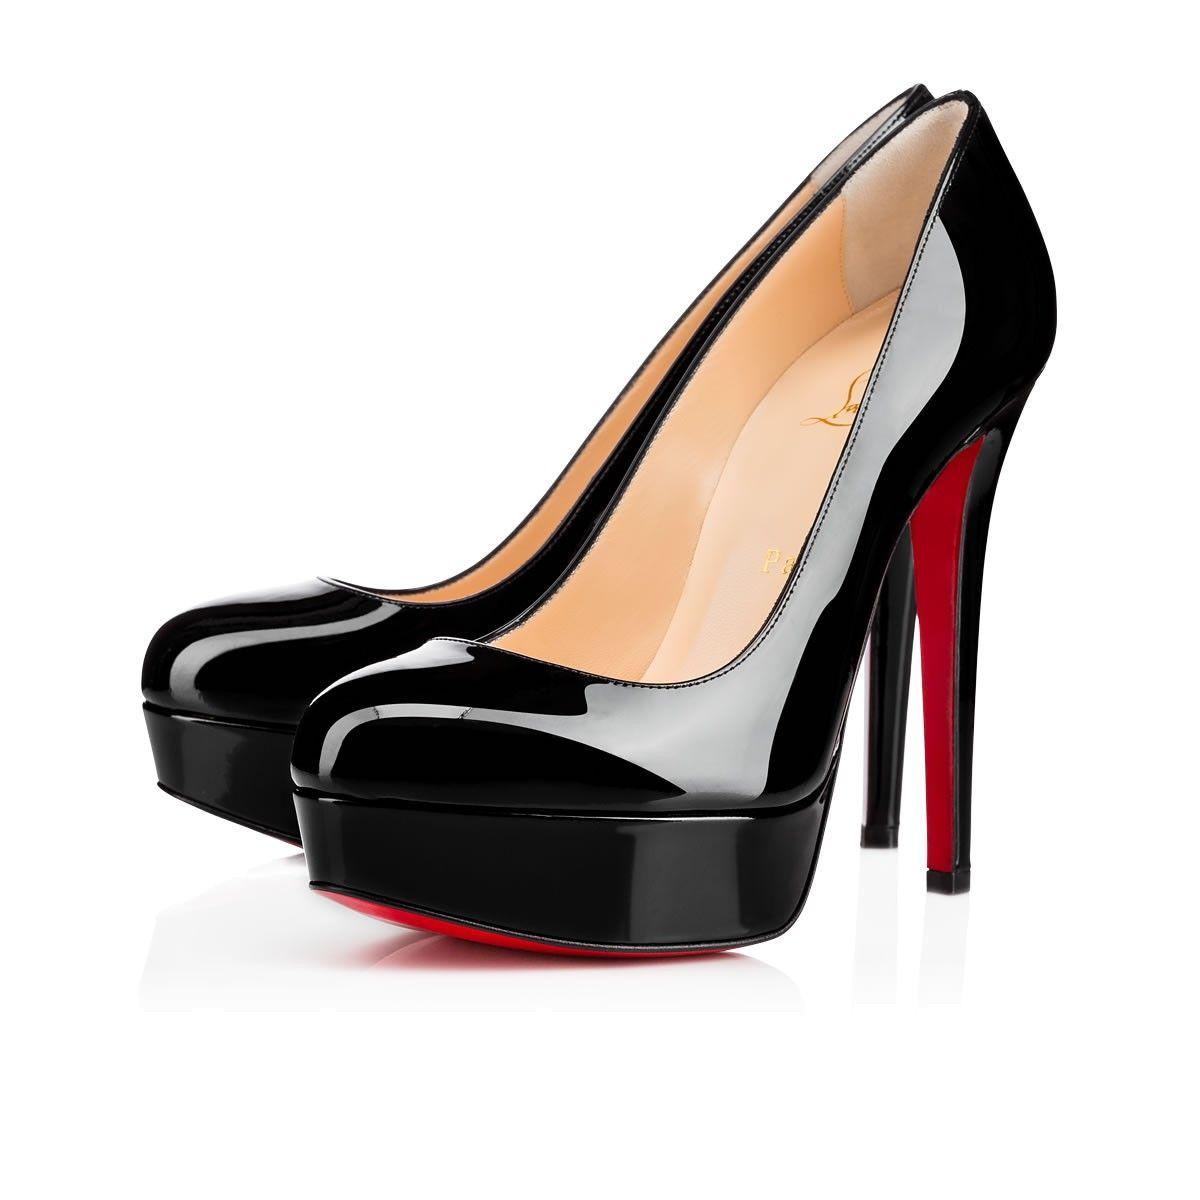 christian louboutin shoes price